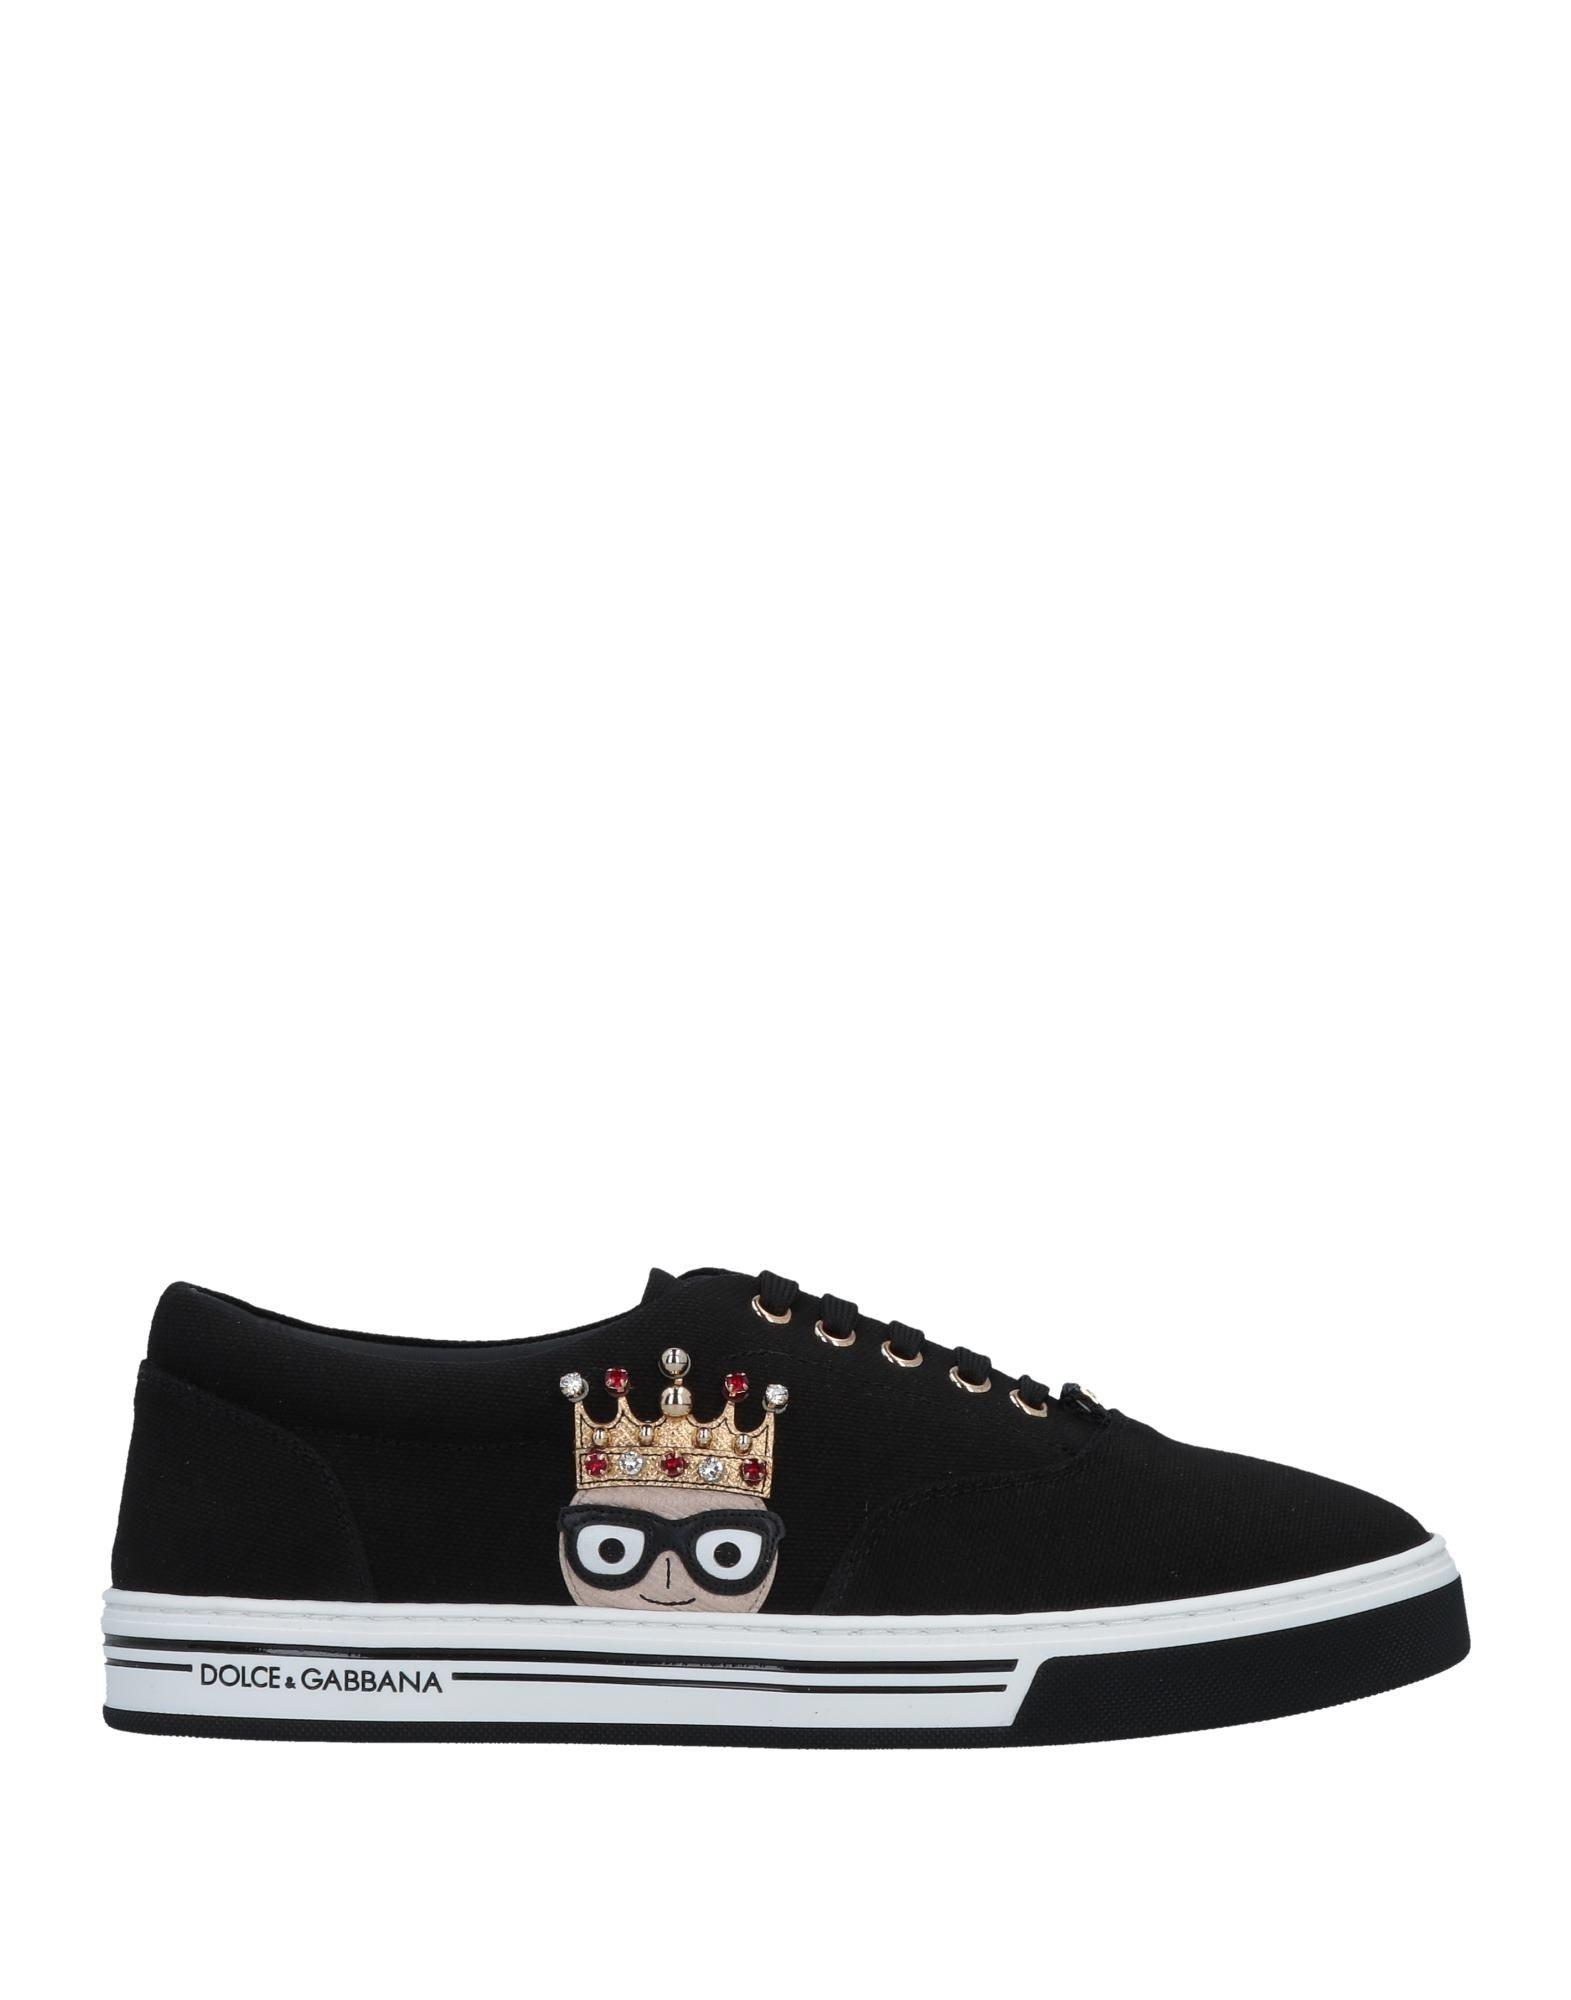 Dolce & Gabbana Sneakers Herren  11510792FH Gute Qualität beliebte Schuhe